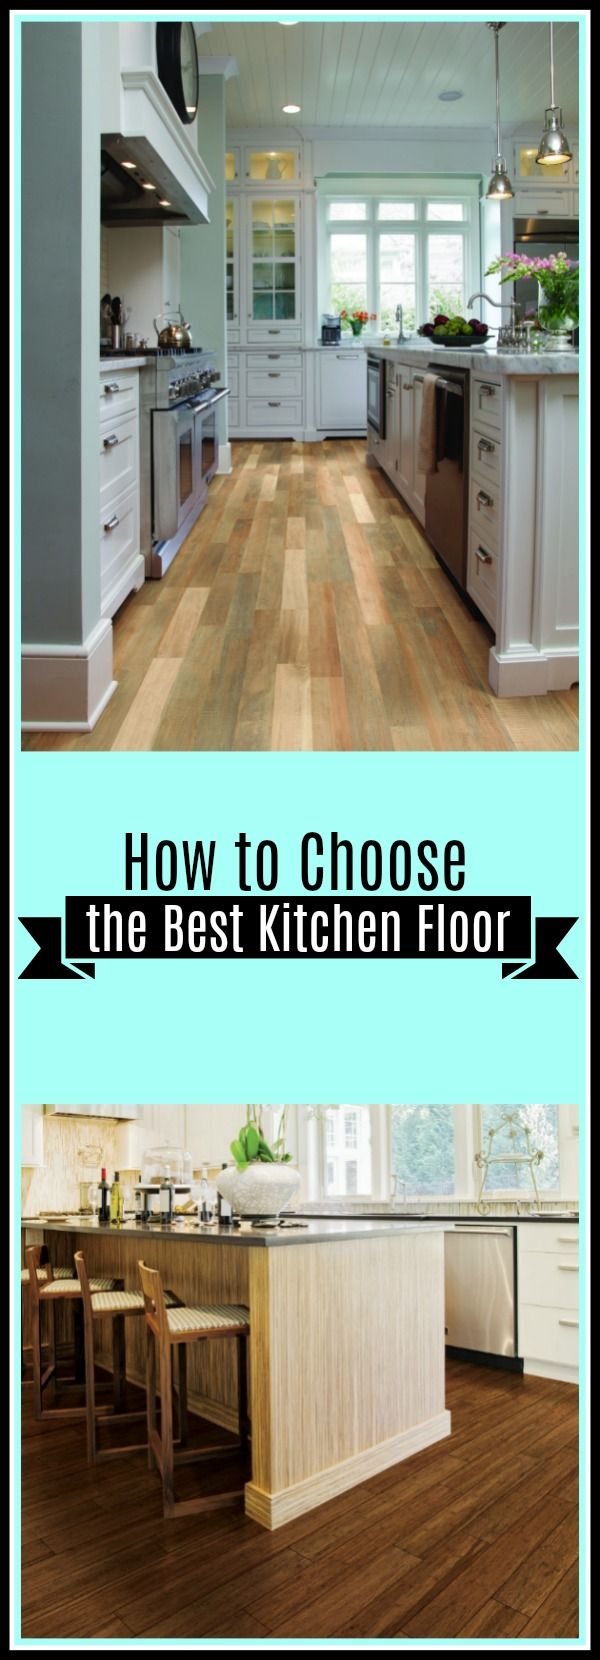 138 best Laminate Flooring images on Pinterest | Flooring ideas ...